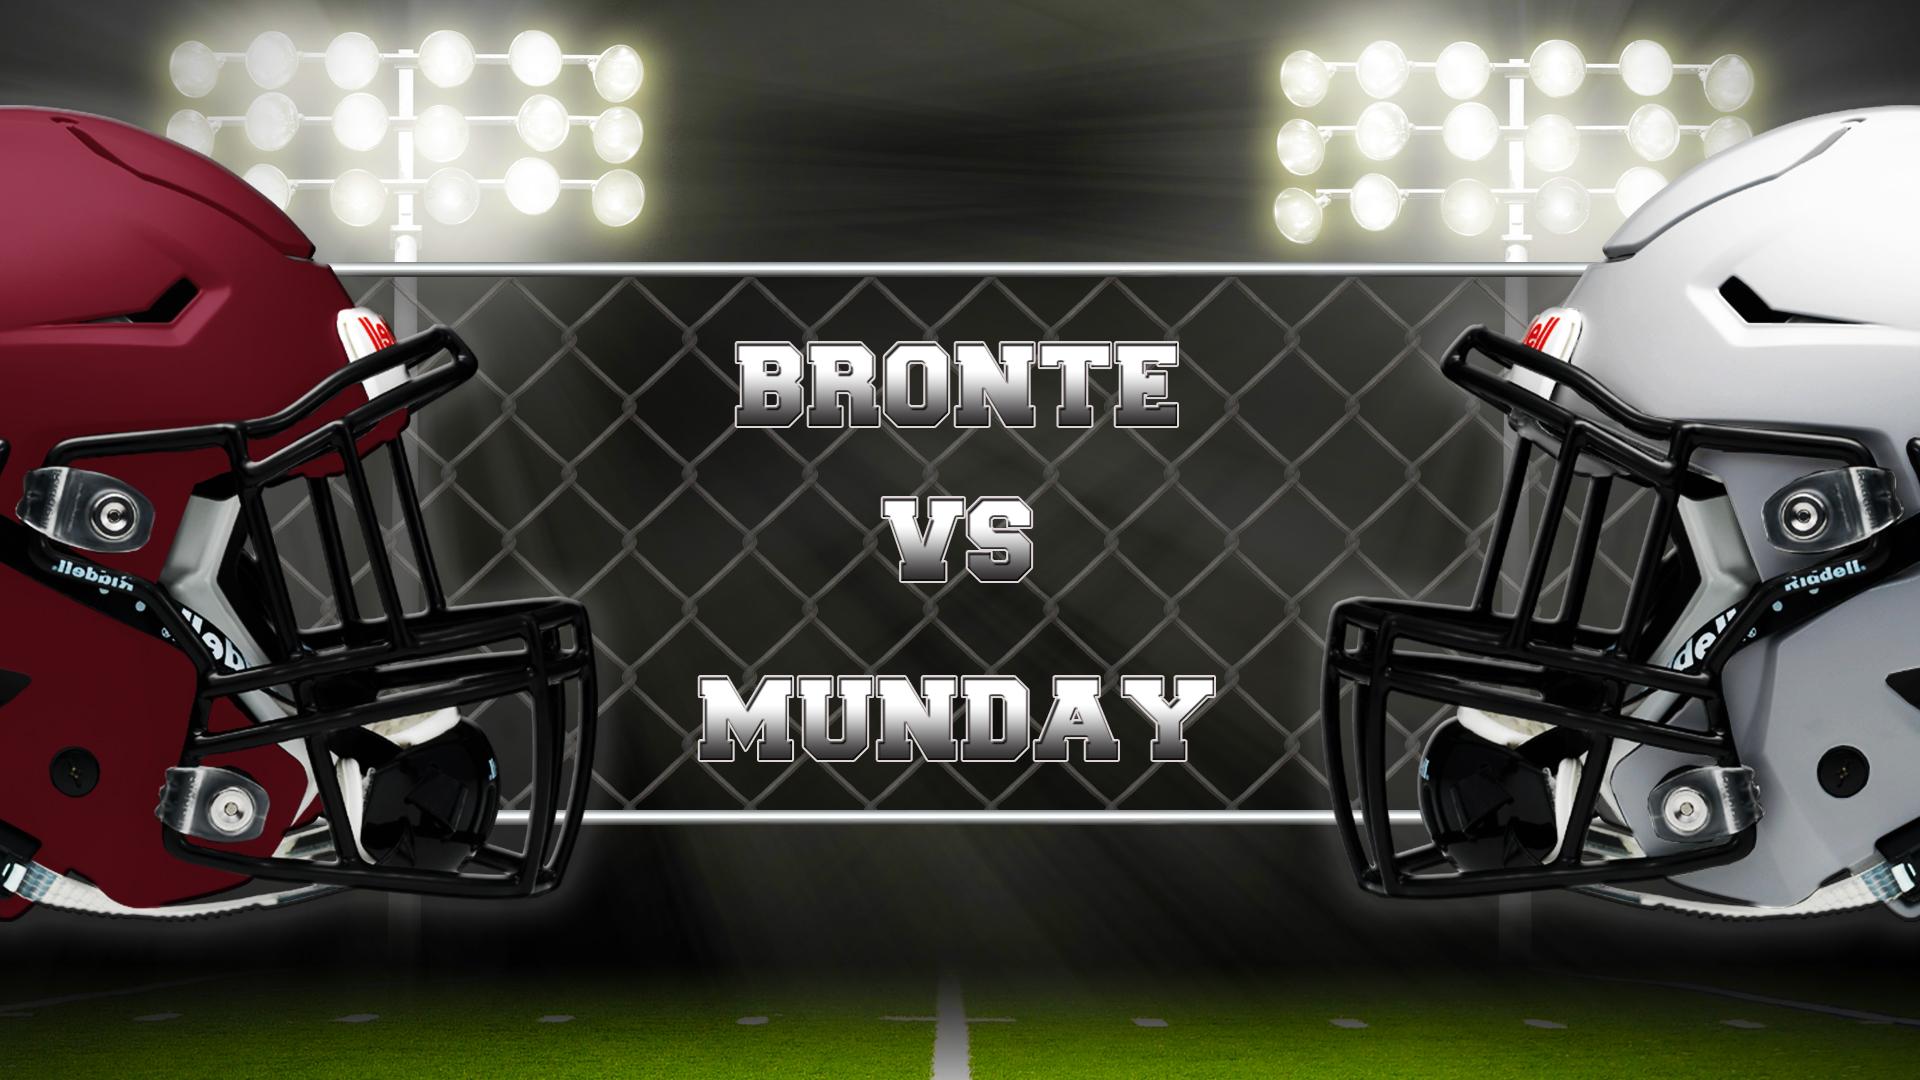 Bronte vs Munday_1473430404363.jpg